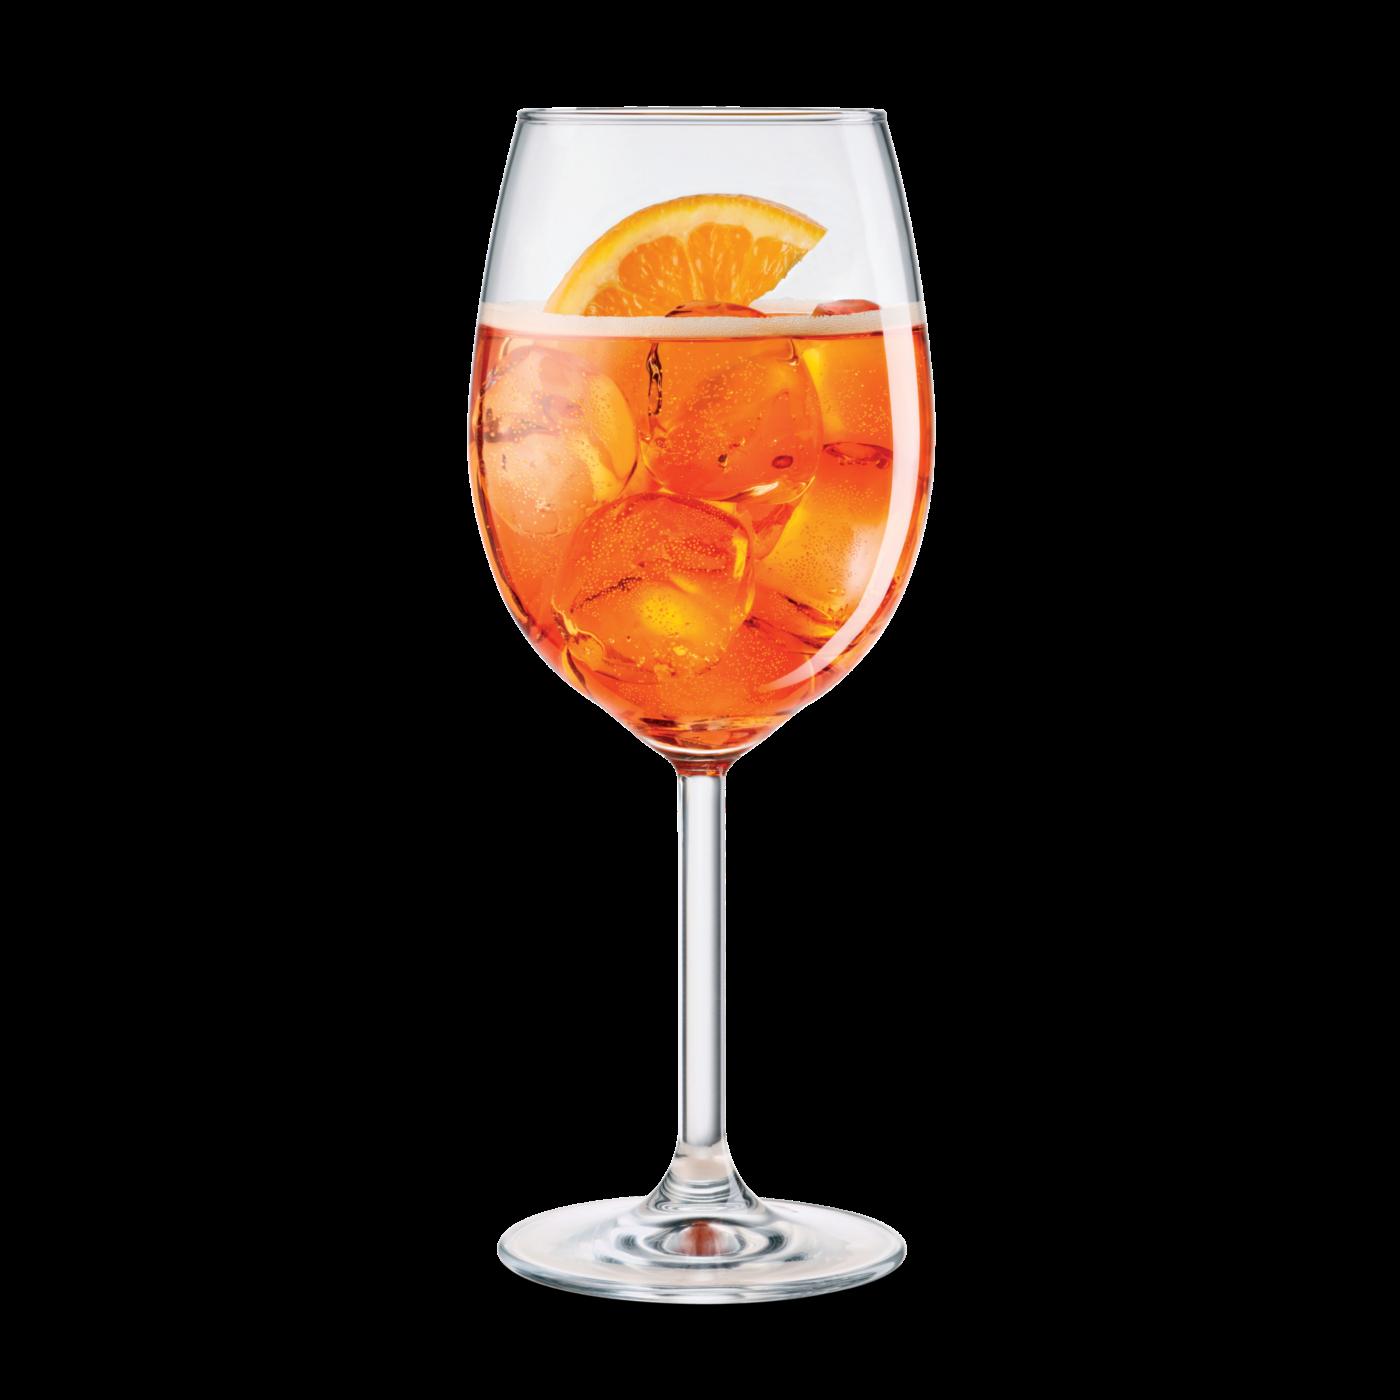 Spritz Aperol #cocktail #aperol #spritz